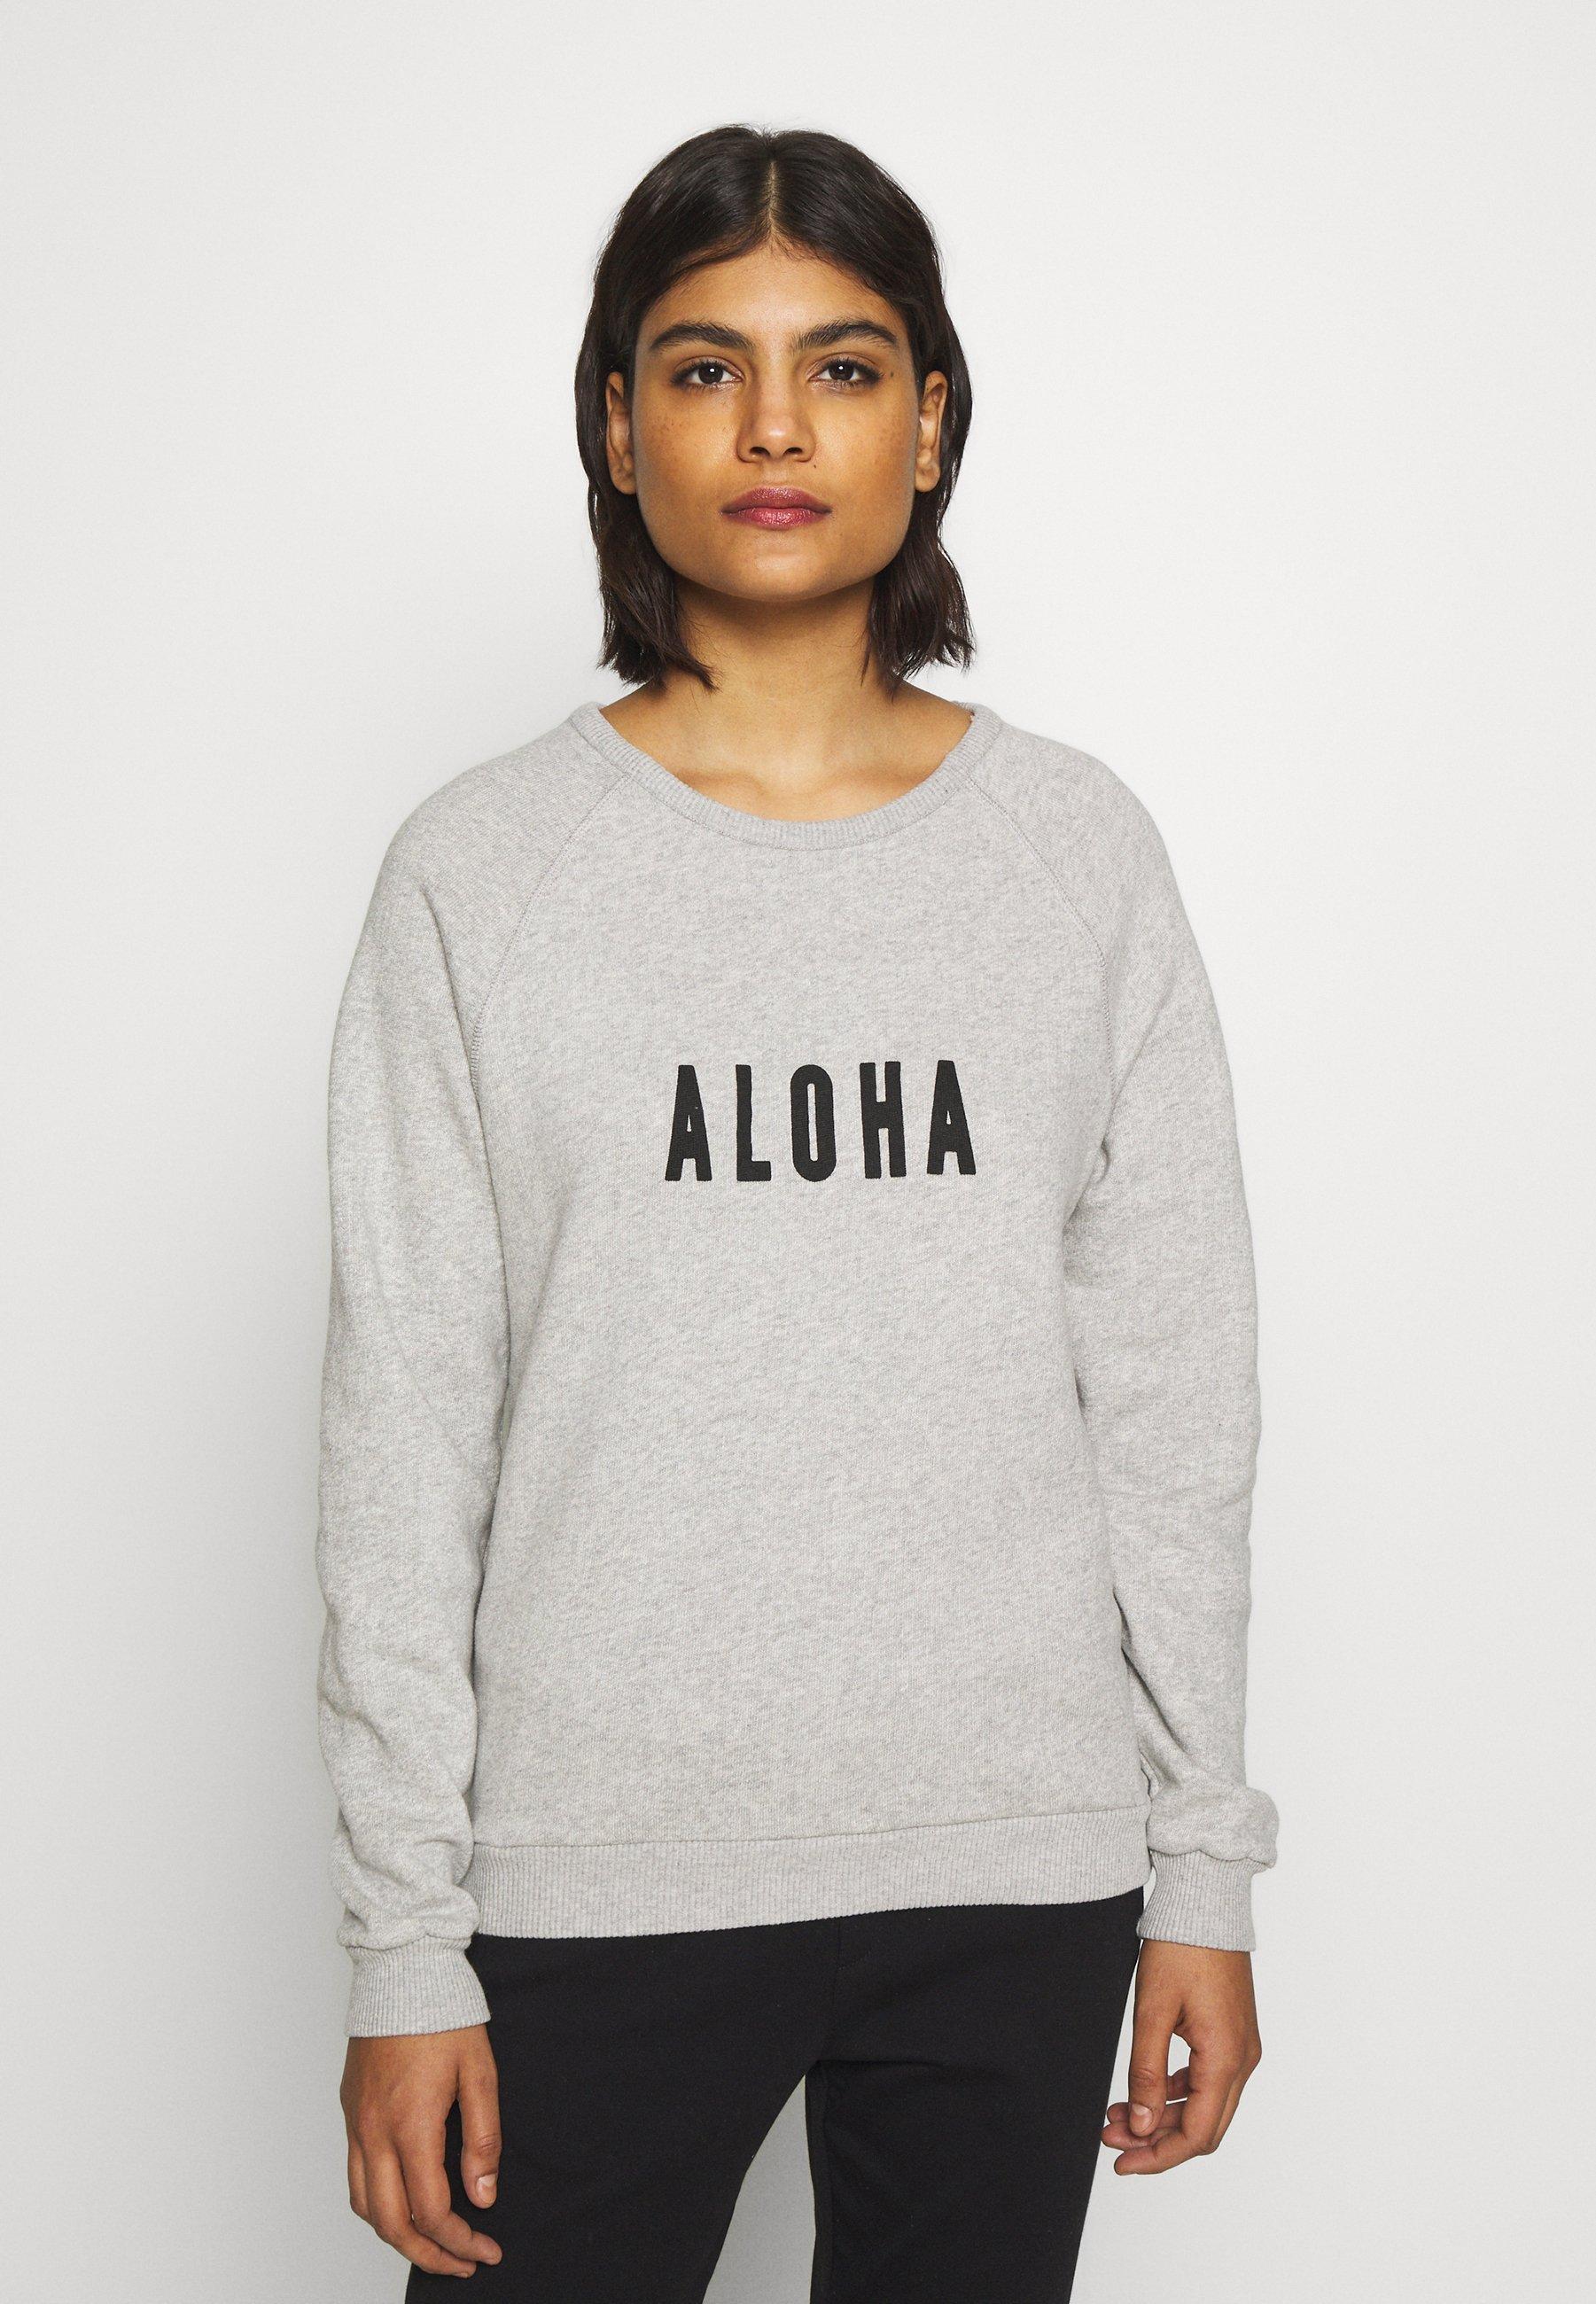 10DAYS ALOHA Sweater light grey meleeGrijs Zalando.nl